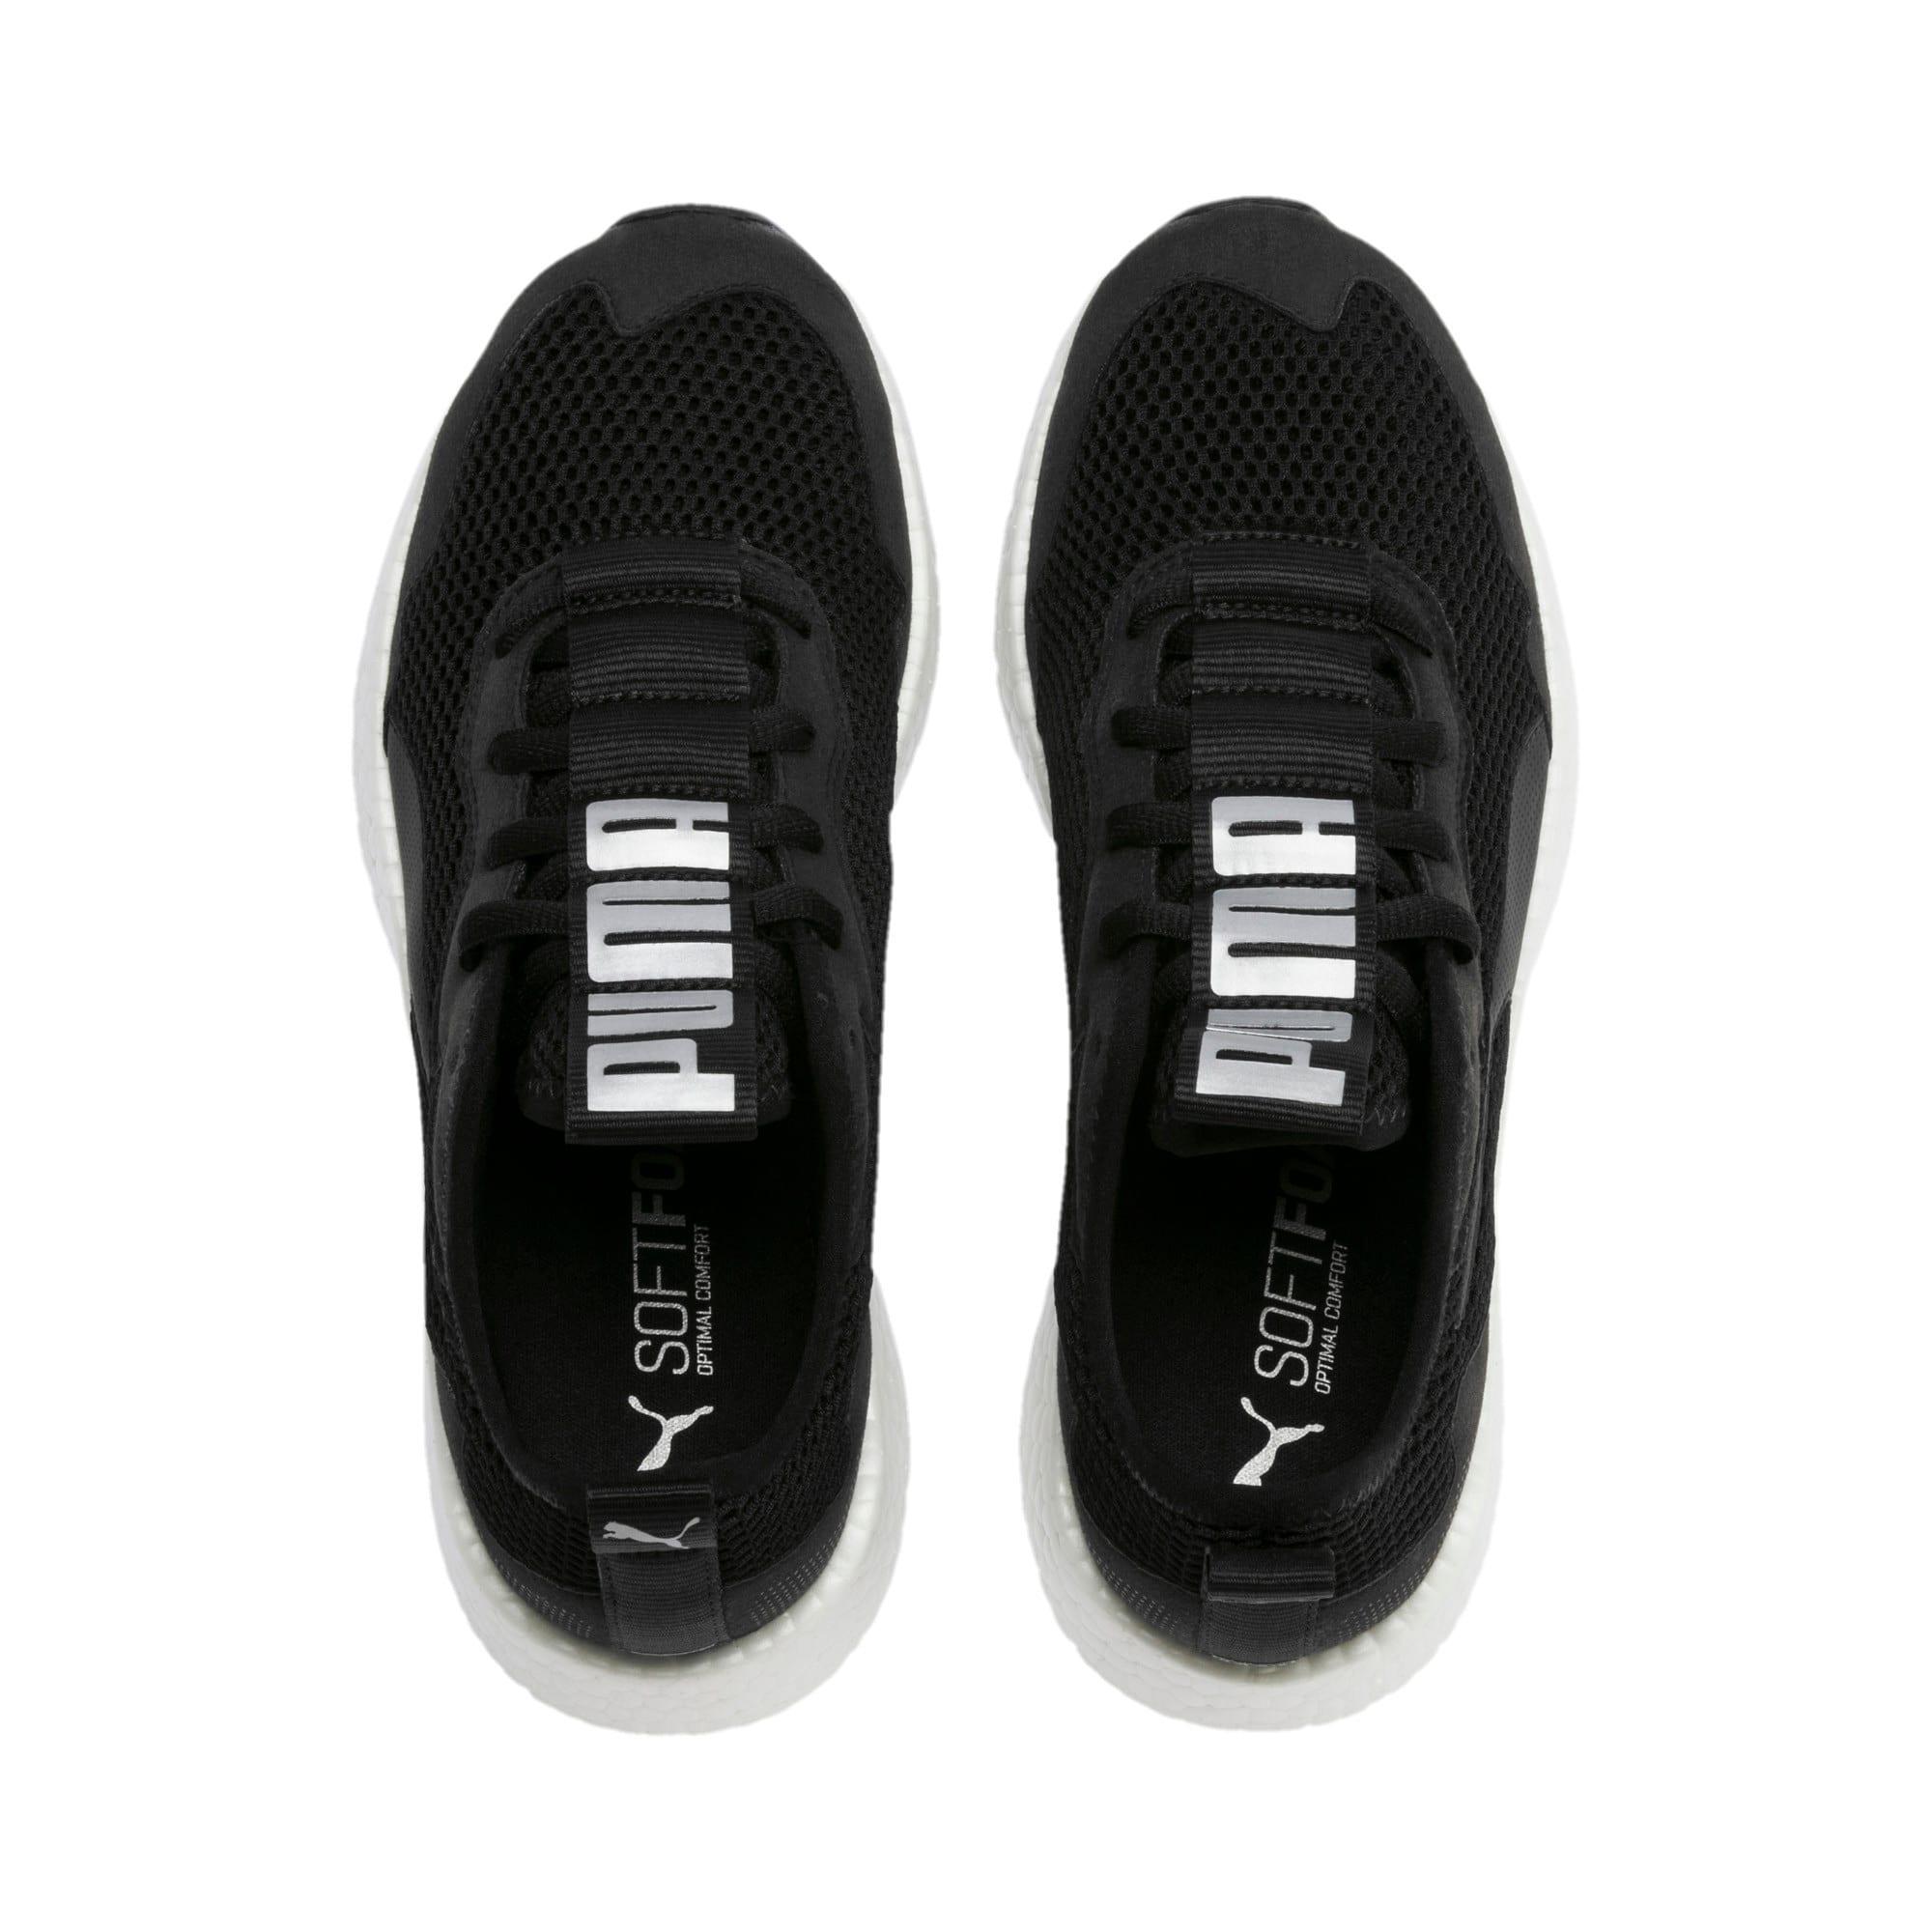 Thumbnail 4 of NRGY Neko Skim Women's Running Shoes, Puma Black-Puma Silver, medium-IND